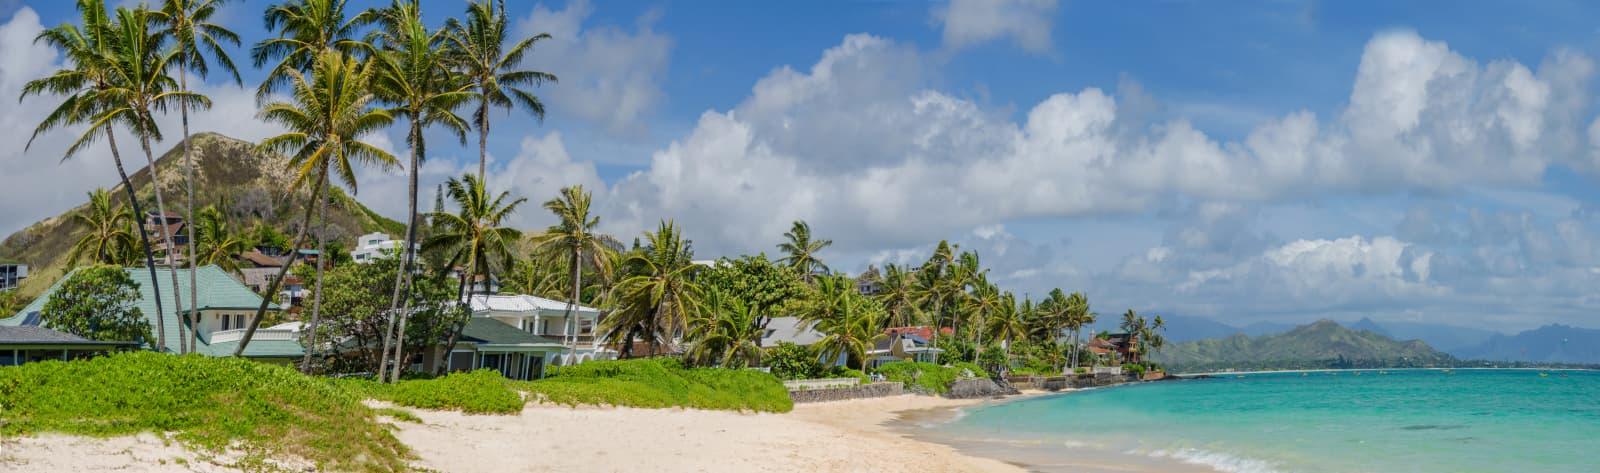 Beach in Lanikai Kailua